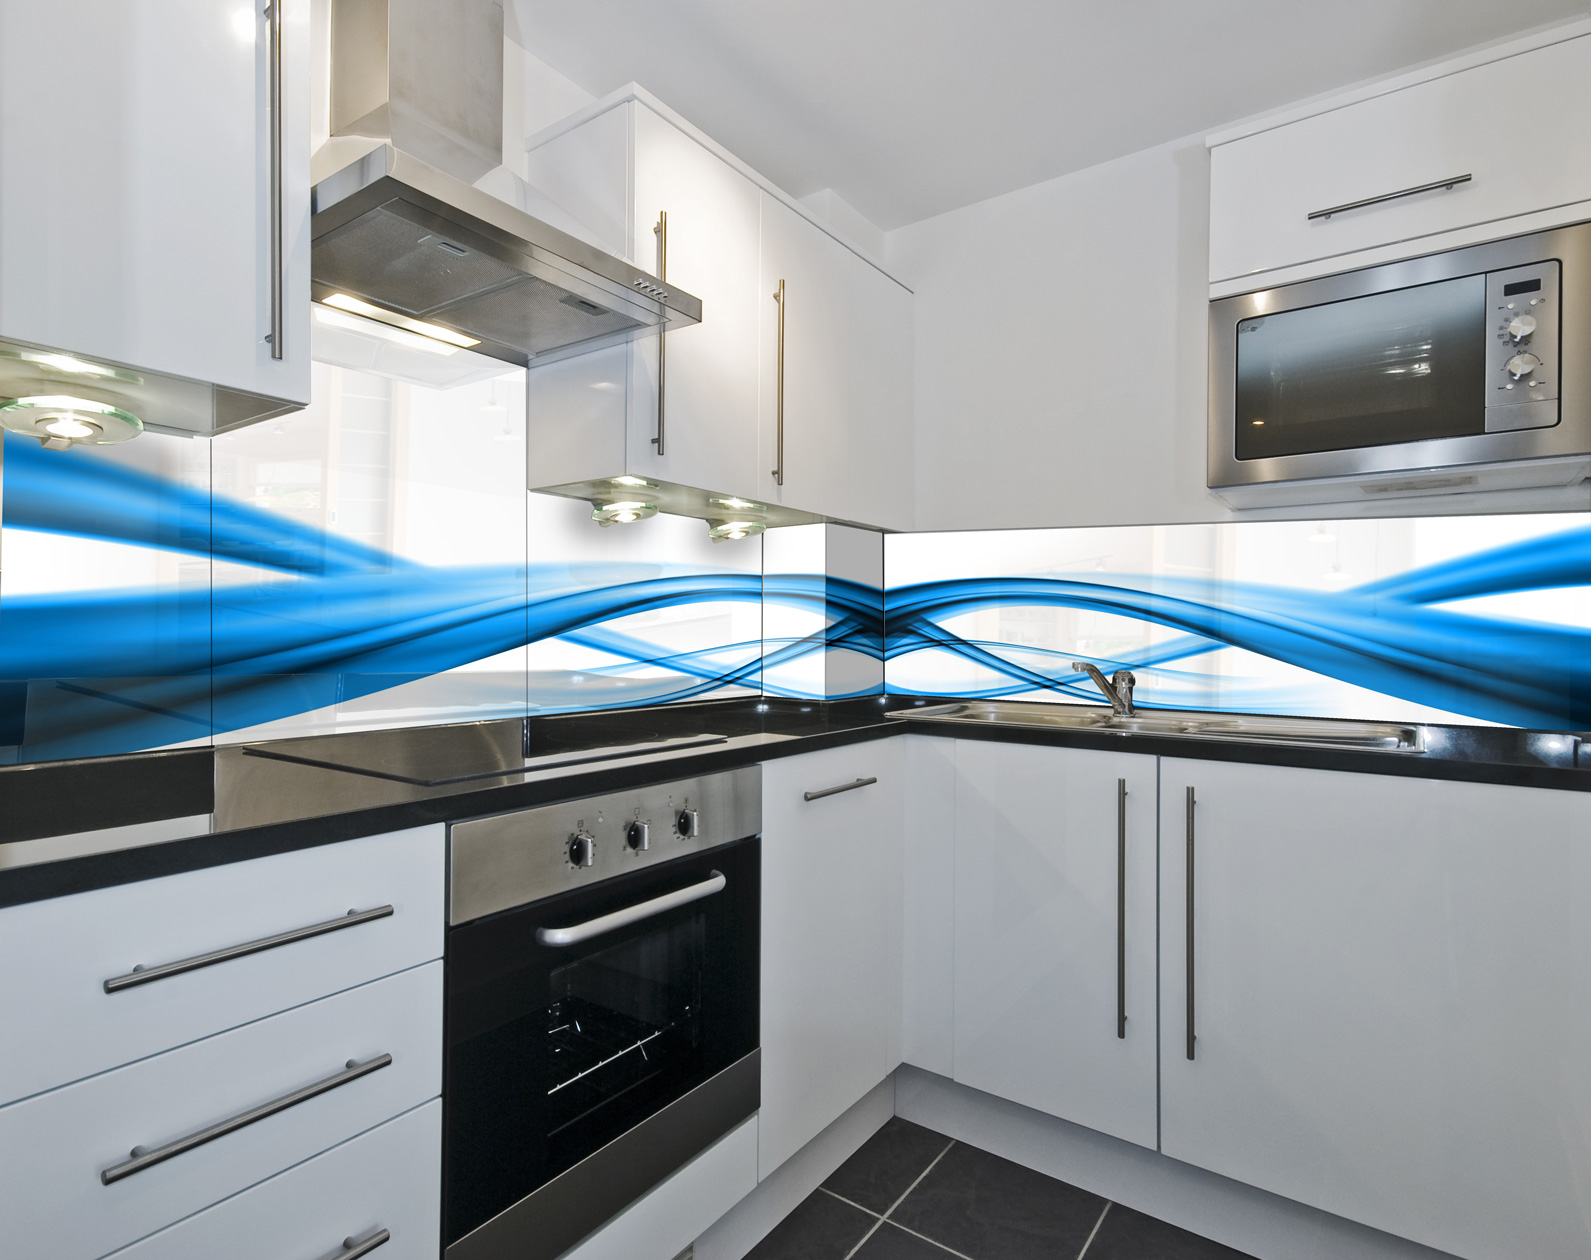 Kitchen Tempered Glass Splashback Protection Blue Abstract Pattern White Ebay